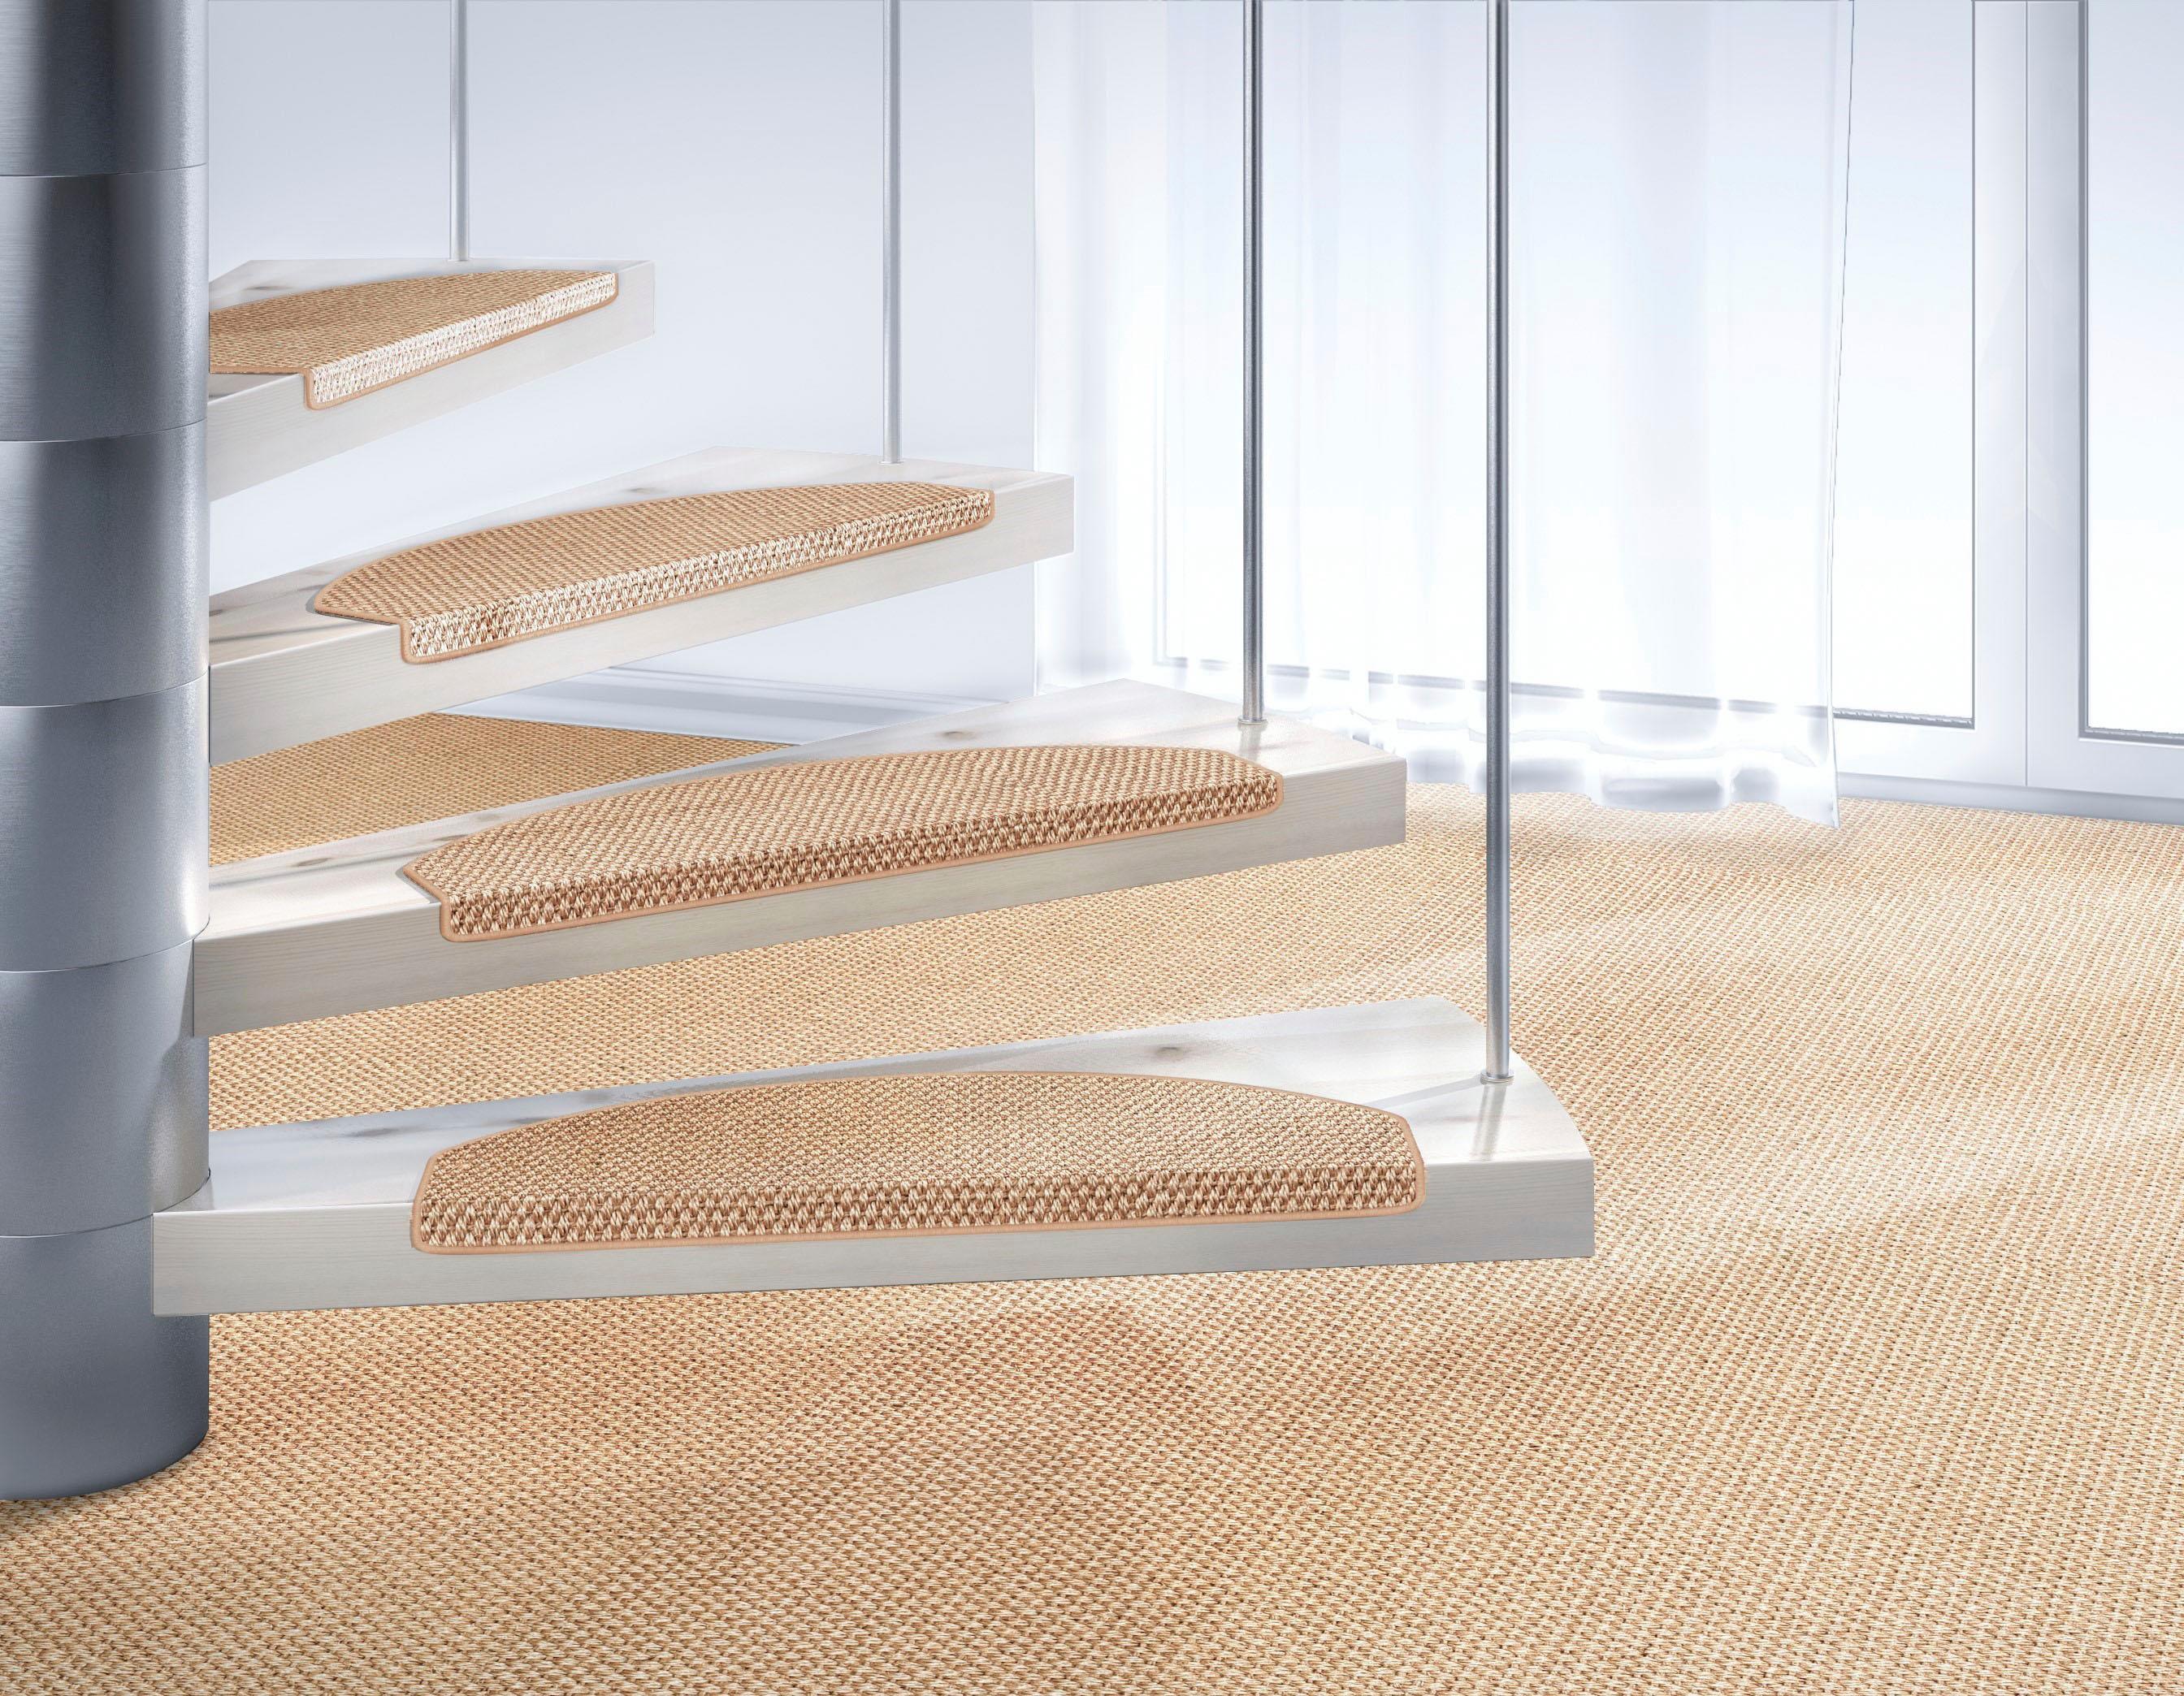 Stufenmatte Brasil Dekowe stufenförmig Höhe 10 mm maschinell gewebt